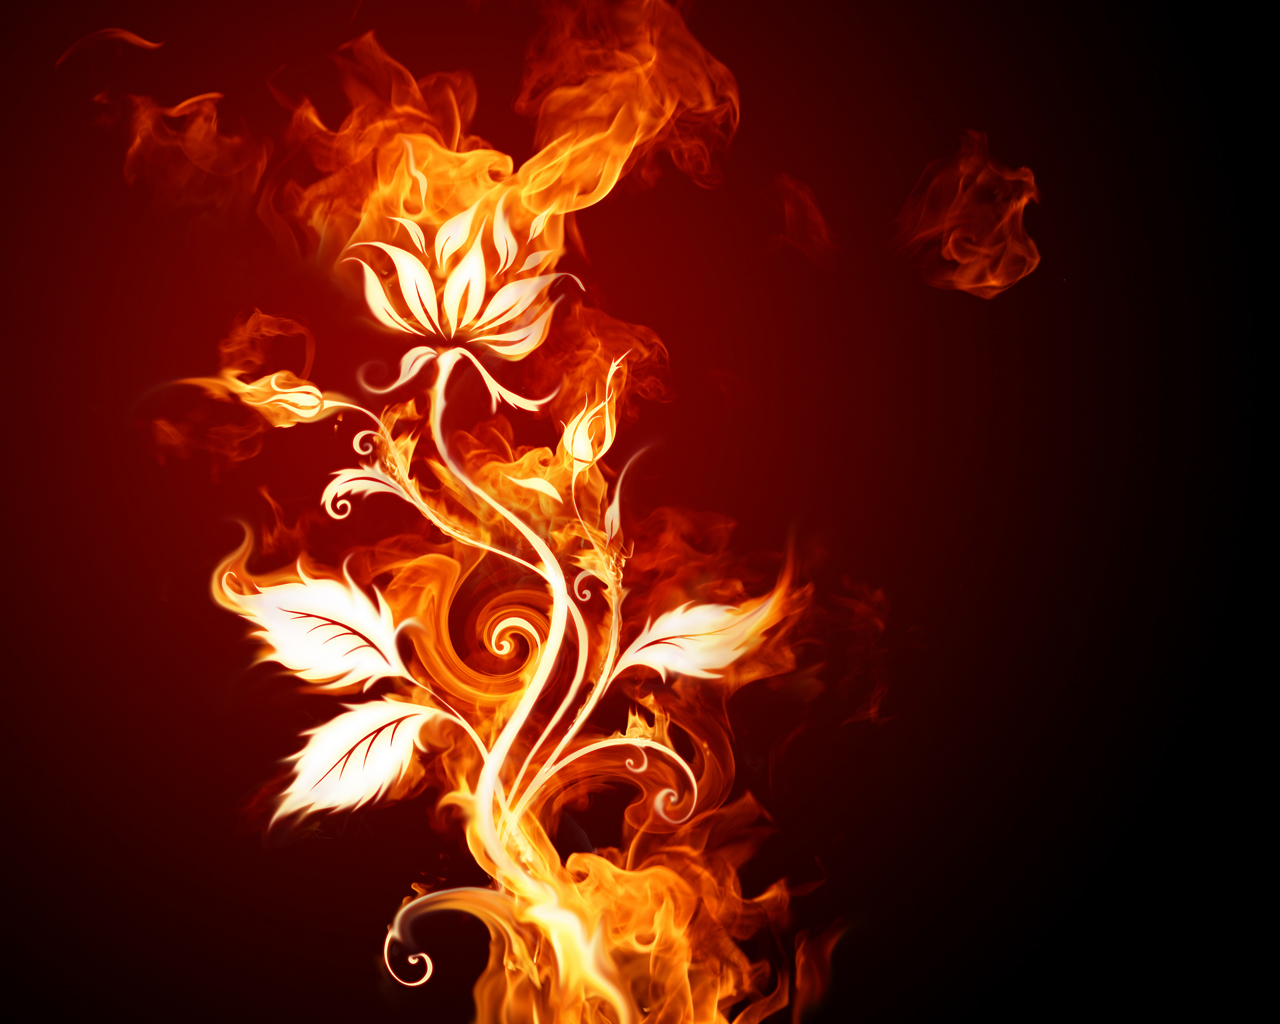 http://2.bp.blogspot.com/-Noiw19R1k5o/TdDUvwv2BZI/AAAAAAAAFBw/LKc-yjwLVAw/s1600/Wallcate.com+-++Fire+HD+Wallpapers+.jpg